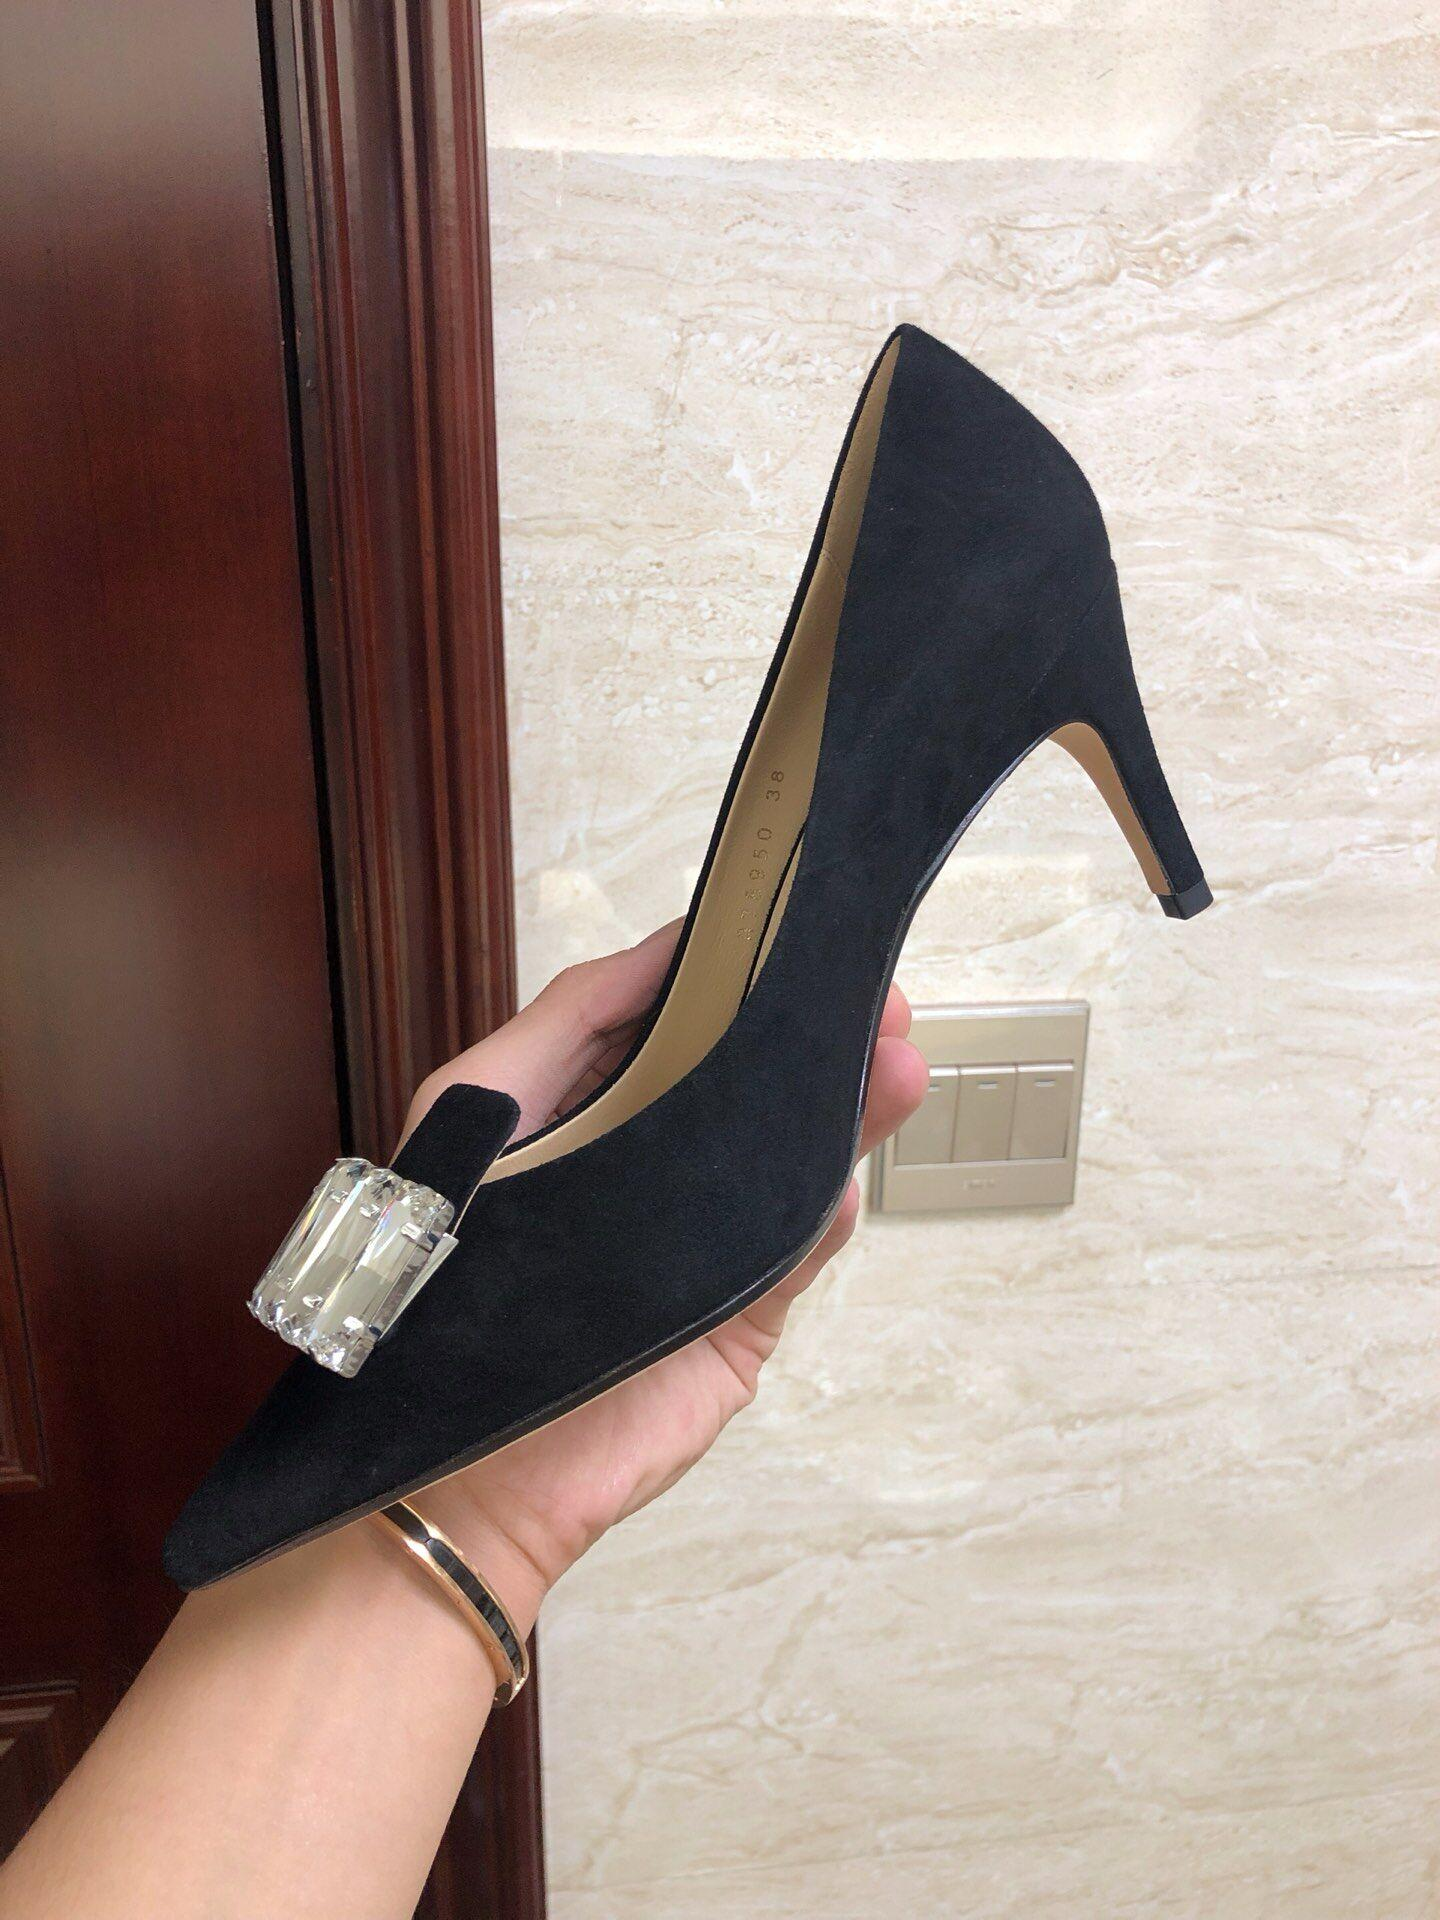 Sergio Rossi pump black heels Sergio Rossi shoes  6